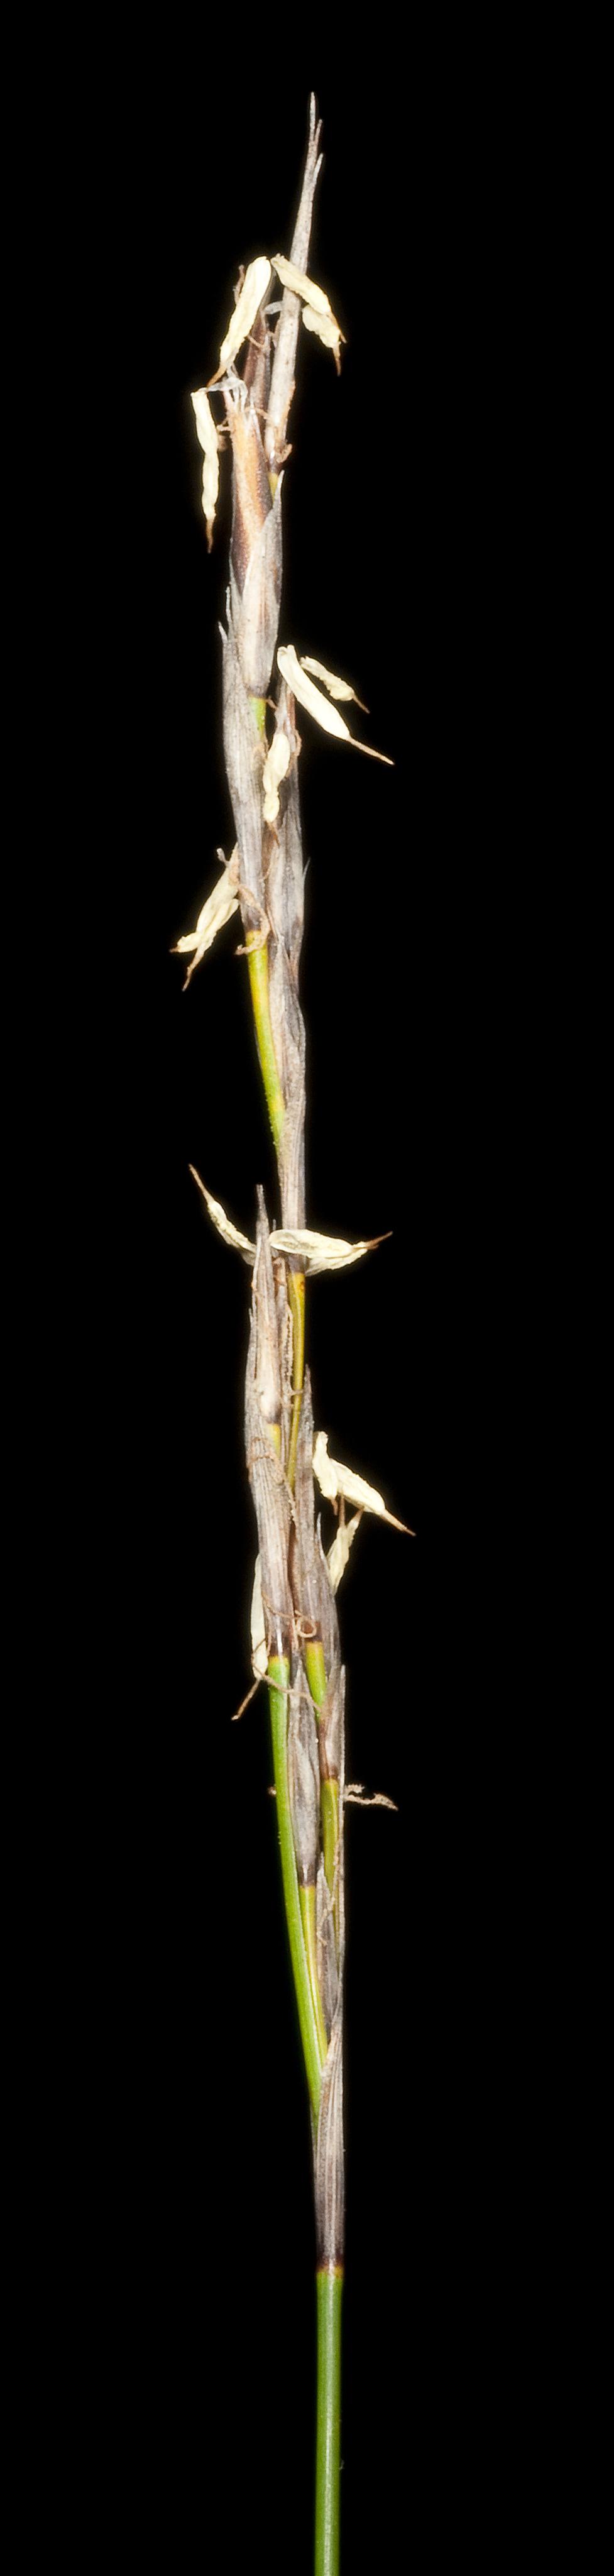 Image of Lepidosperma